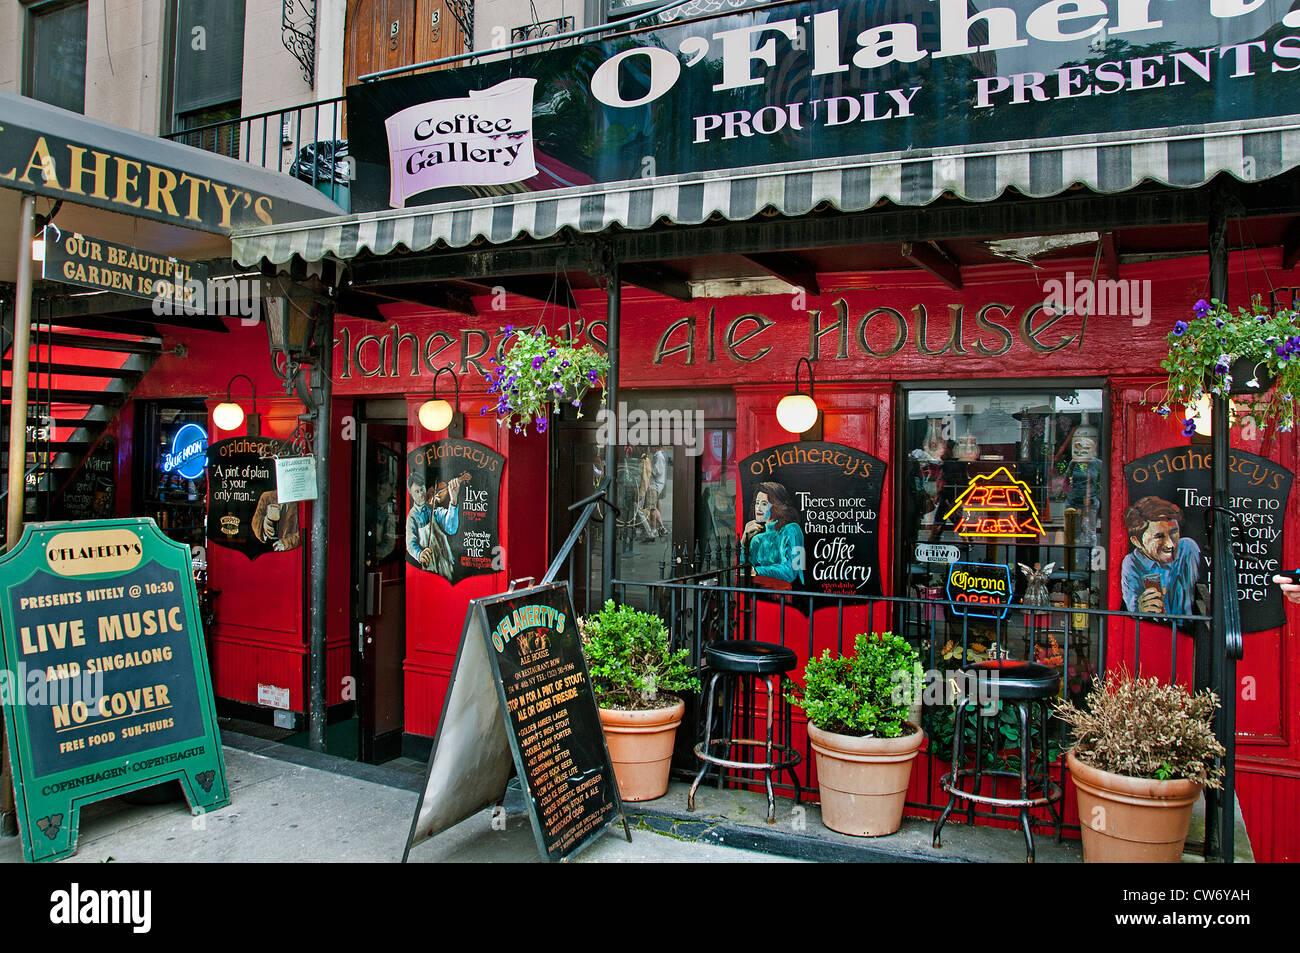 O'Flaherty's Ale House 334 West 46th St. On Restaurant Row New York City Manhattan - Stock Image